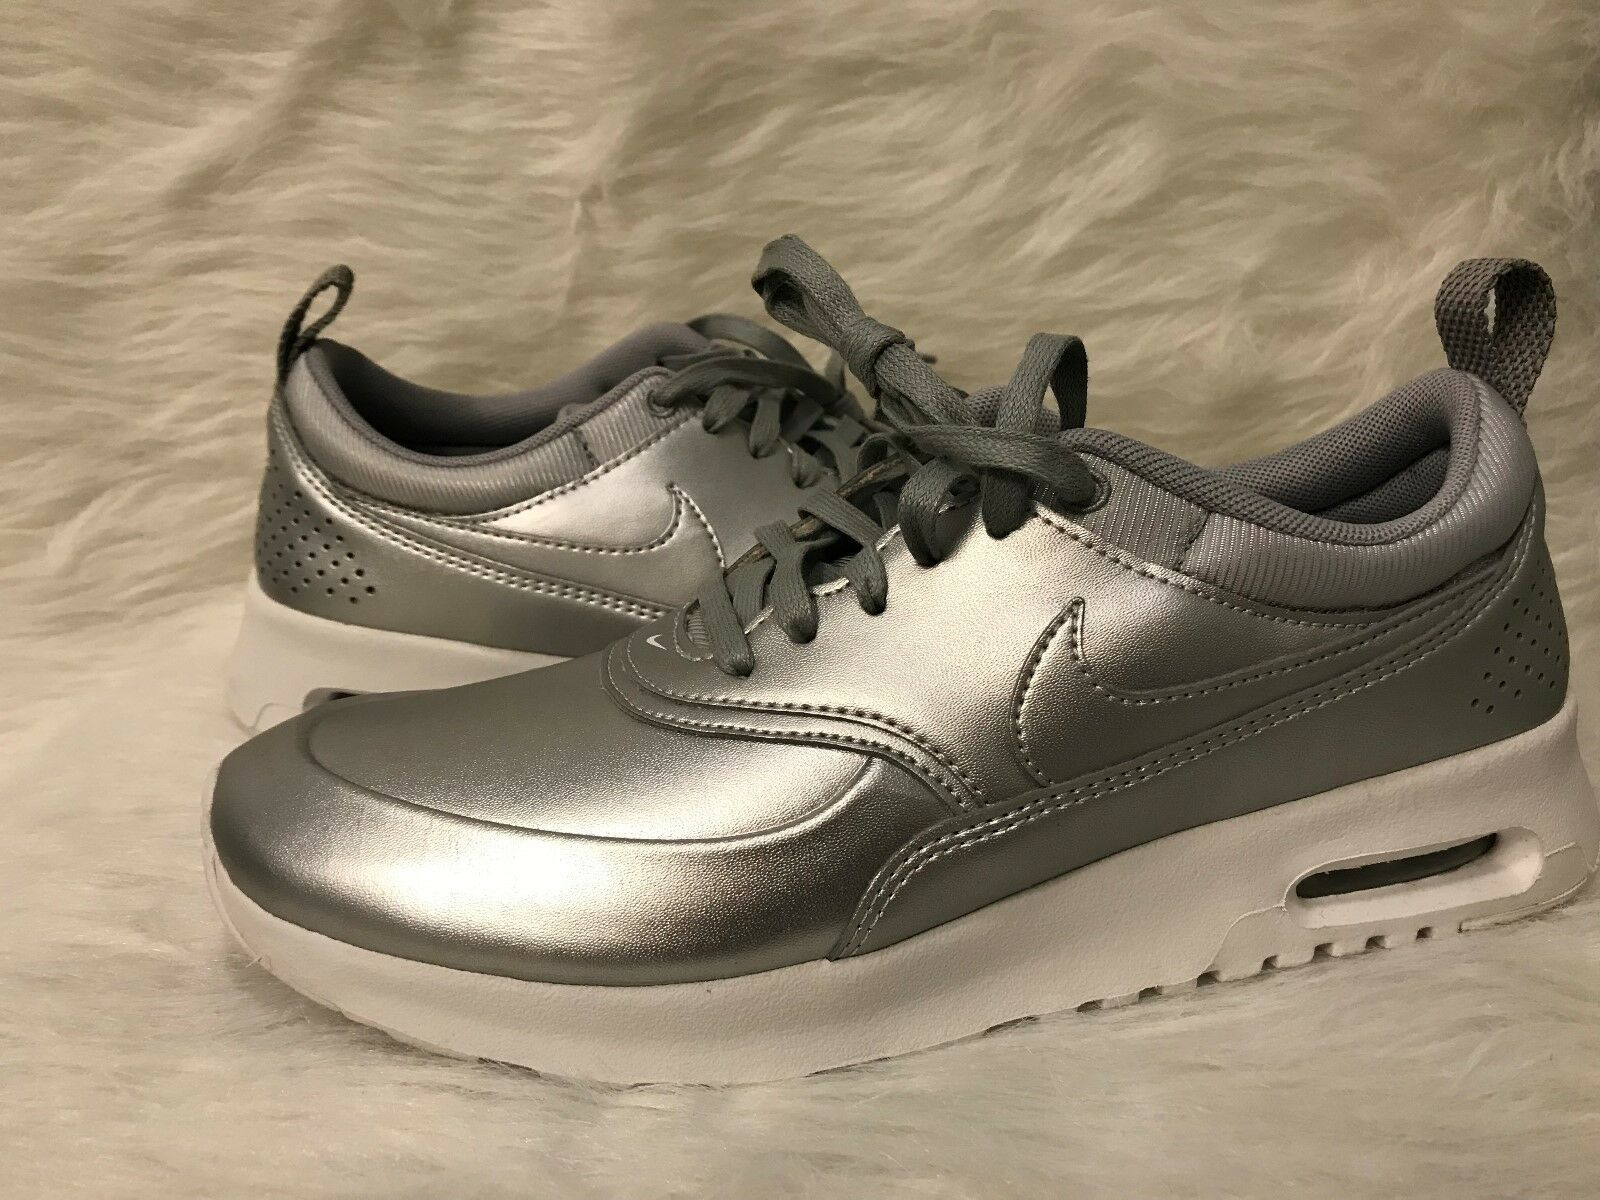 861674-001 Silver Women's Nike Size: 8